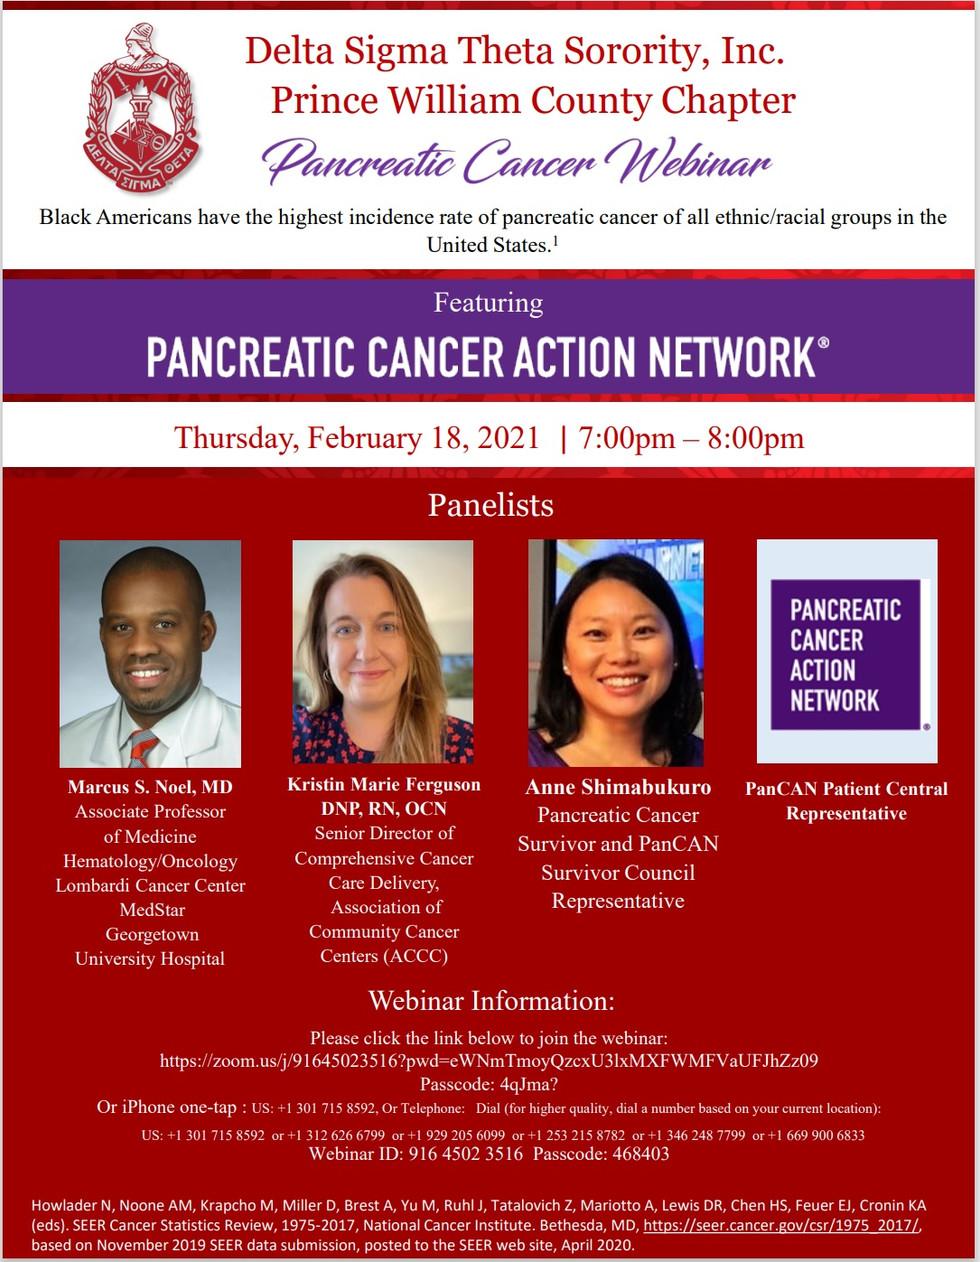 Pancreatic Cancer Webinar